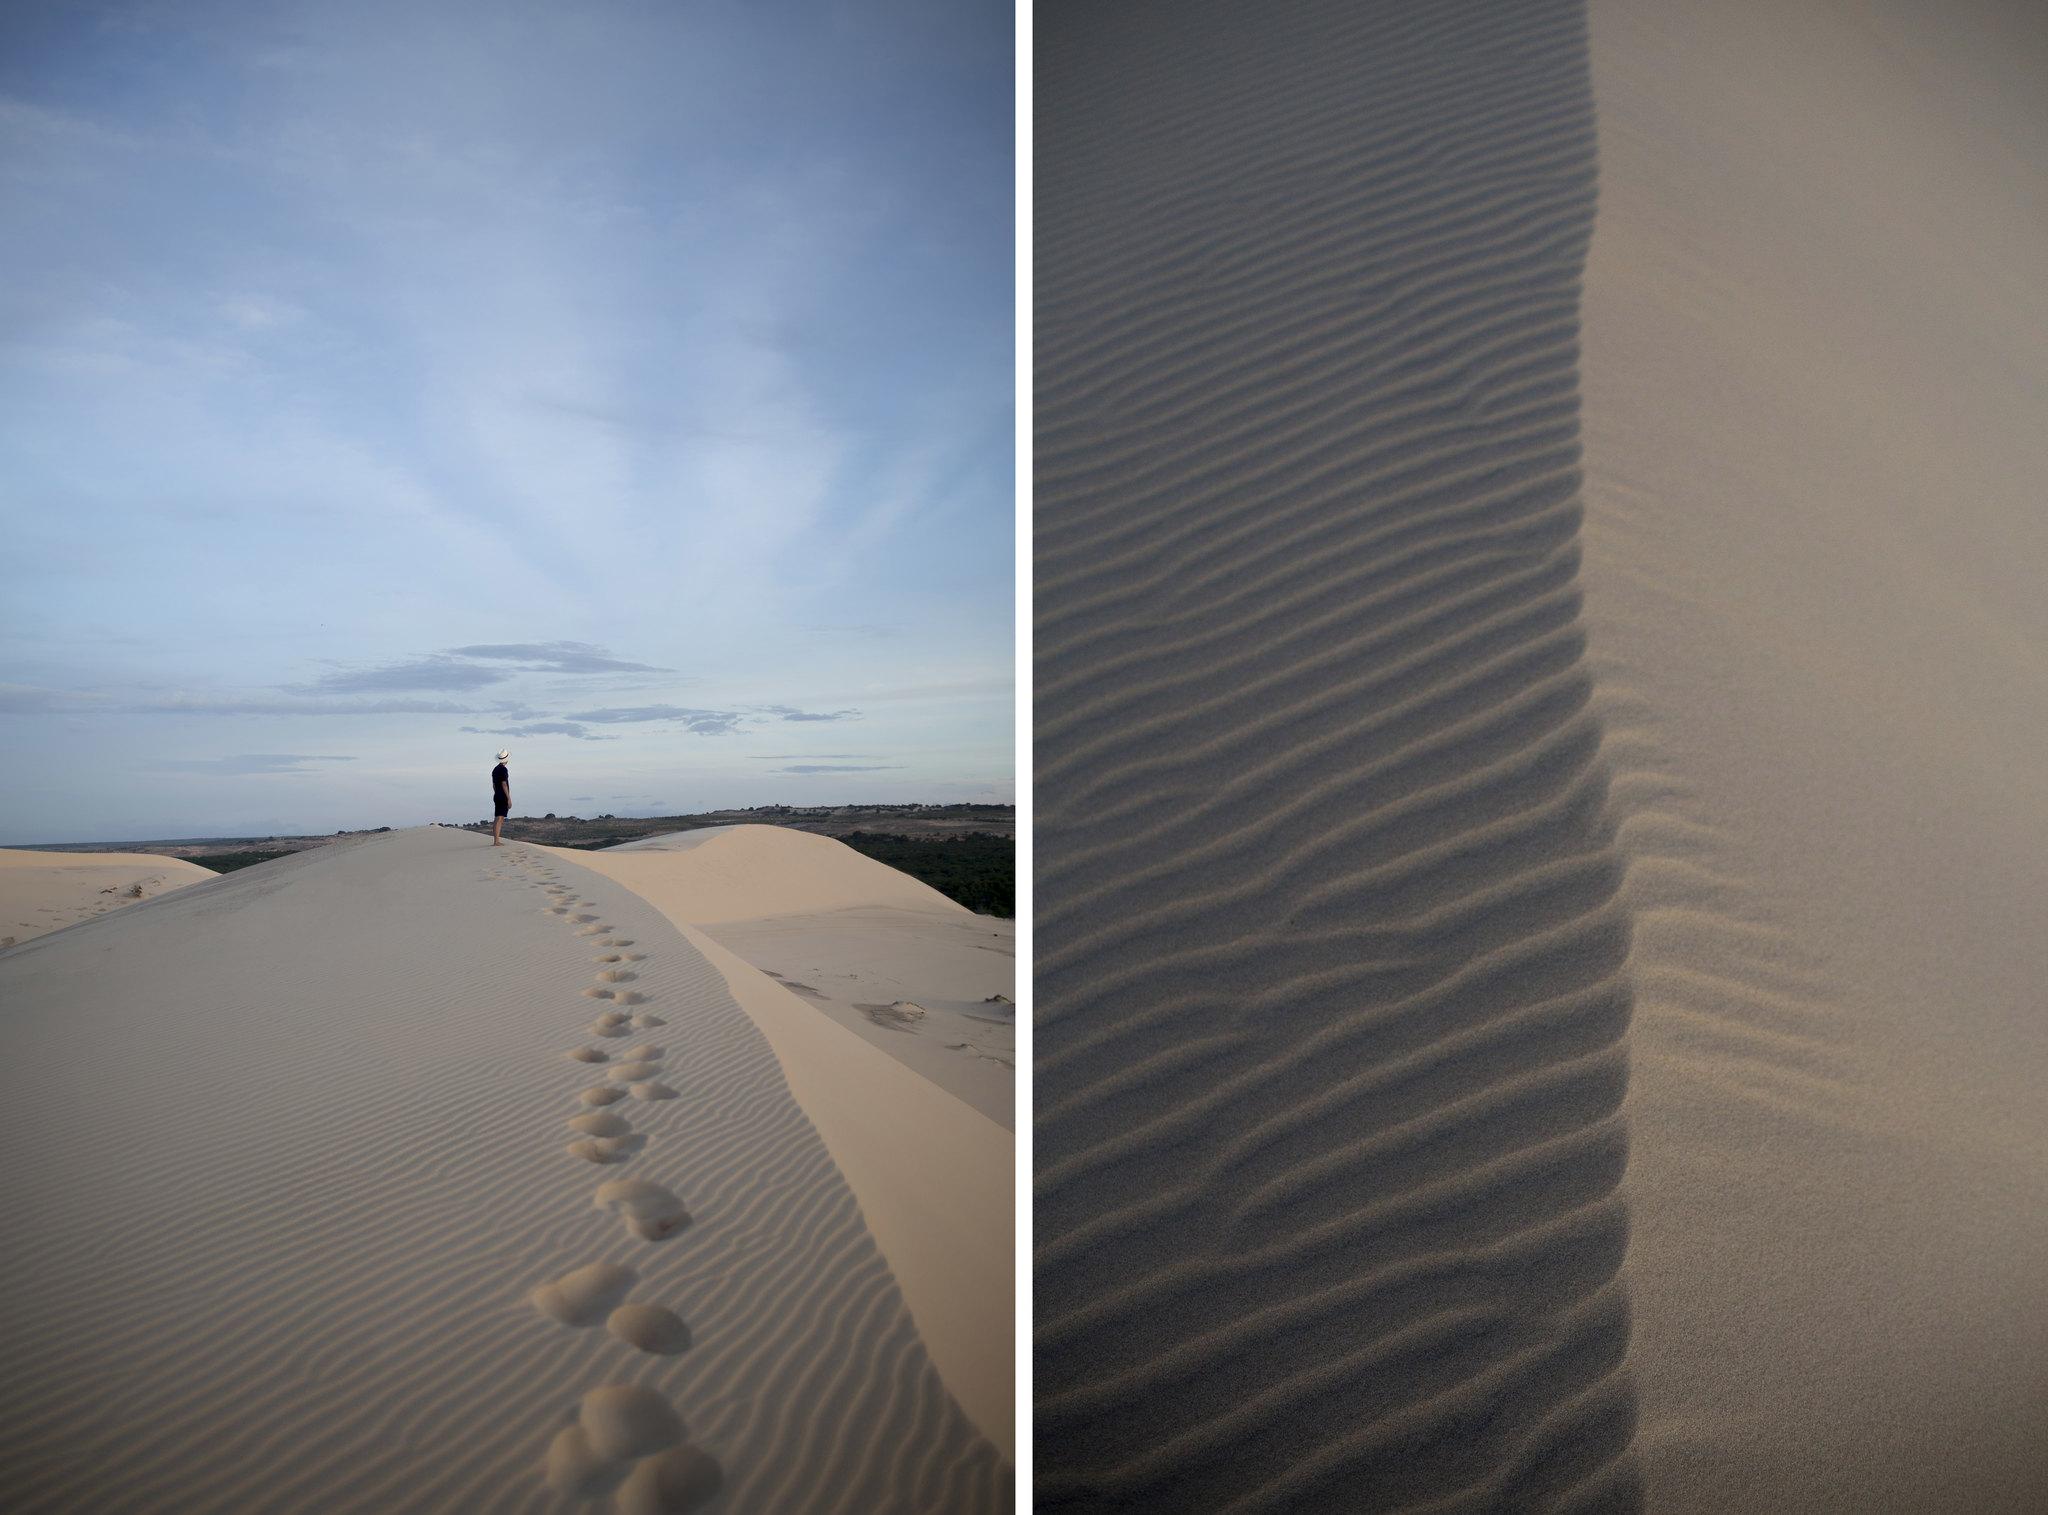 Jordan_Bunker_sand_dunes_4